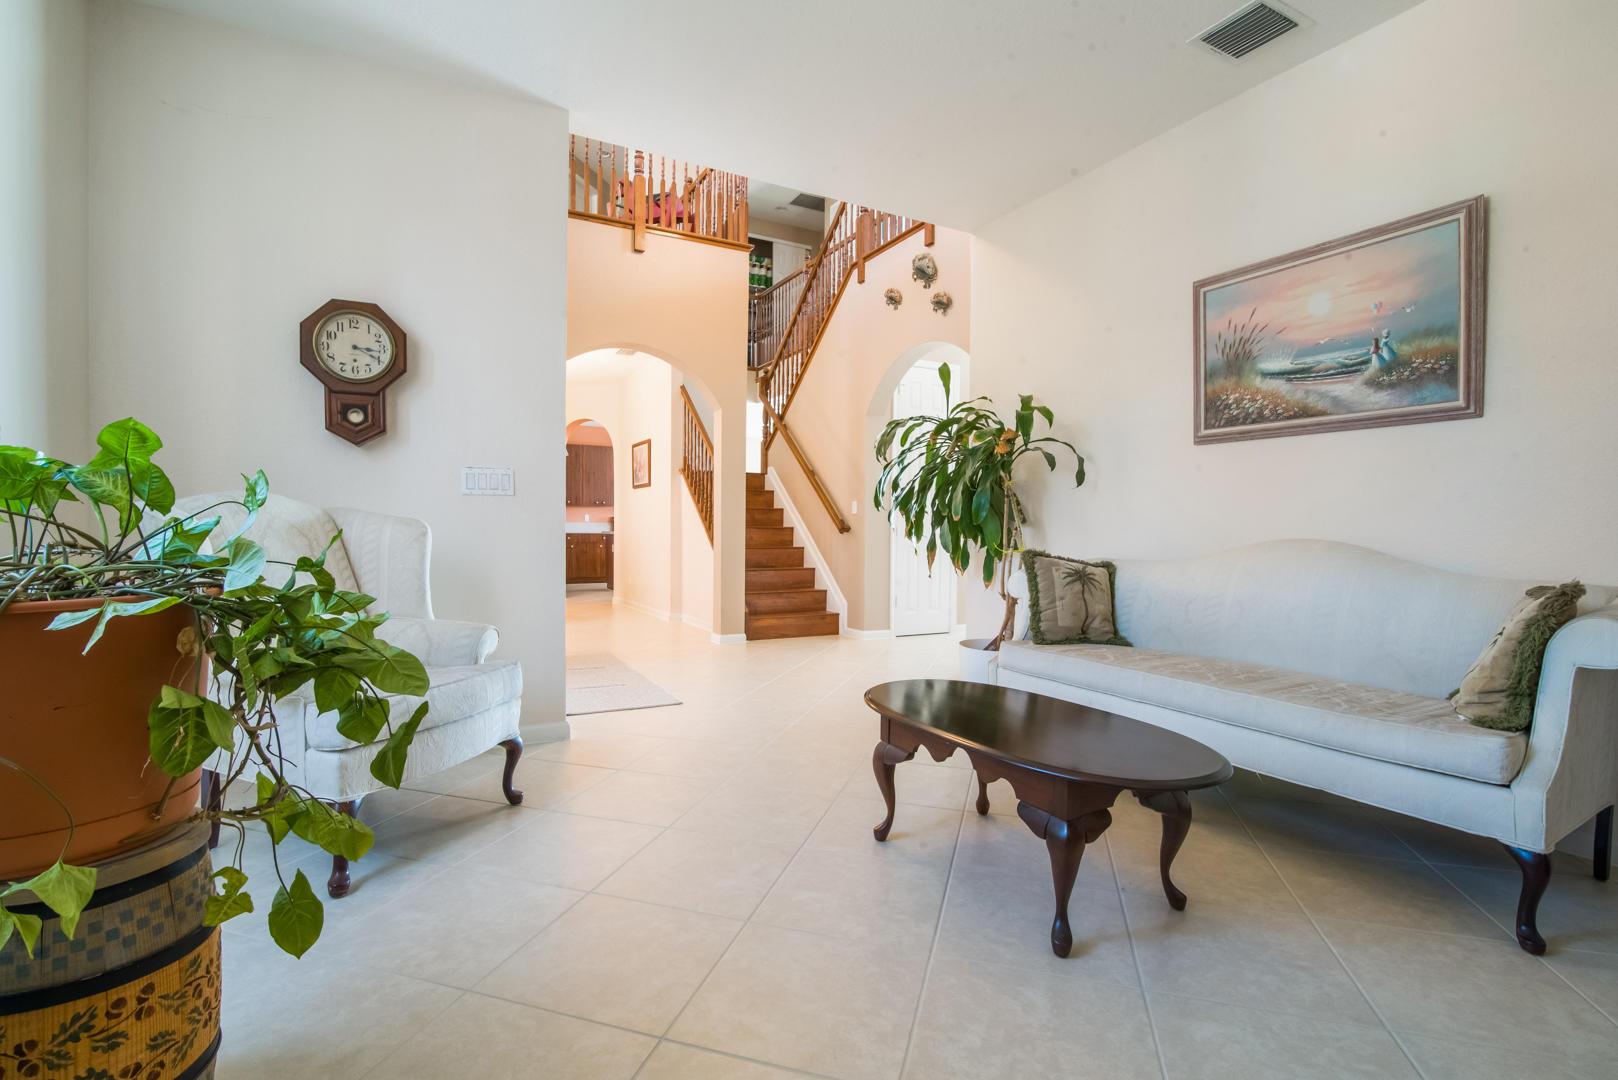 191 Bella Vista Way Royal Palm Beach, FL 33411 photo 11